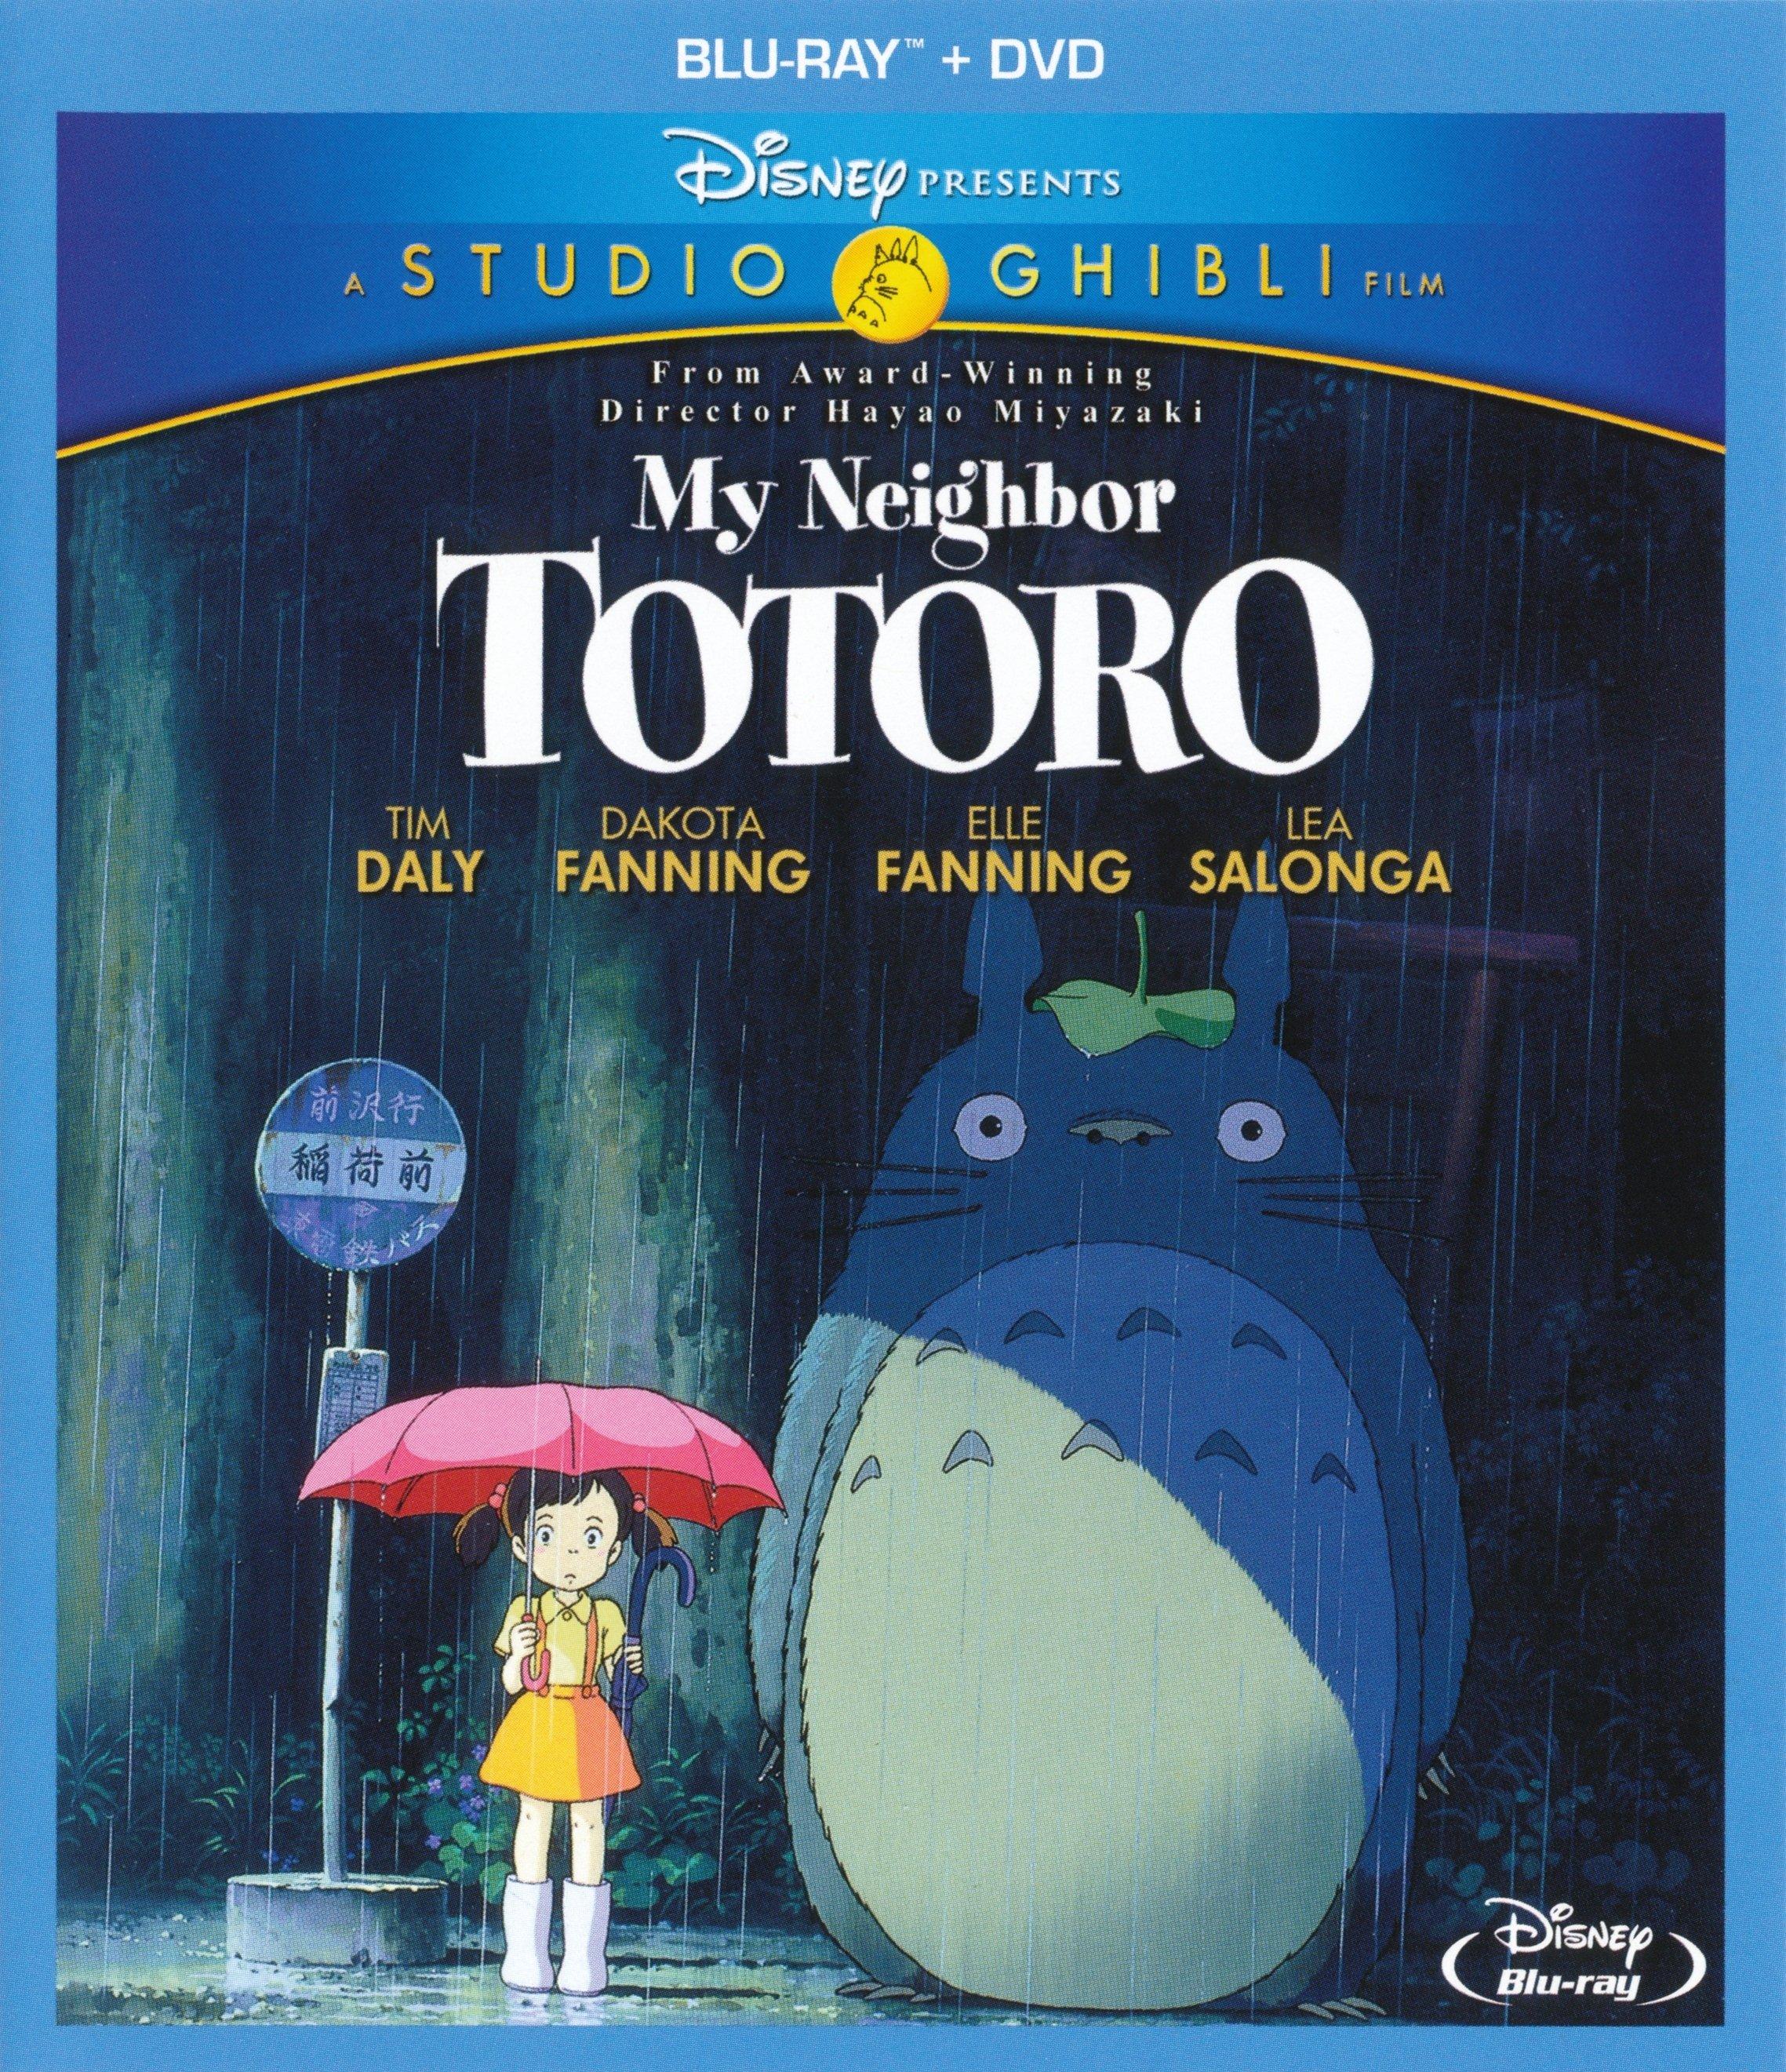 Review: Hayao Miyazaki's My Neighbor Totoro on Disney Blu